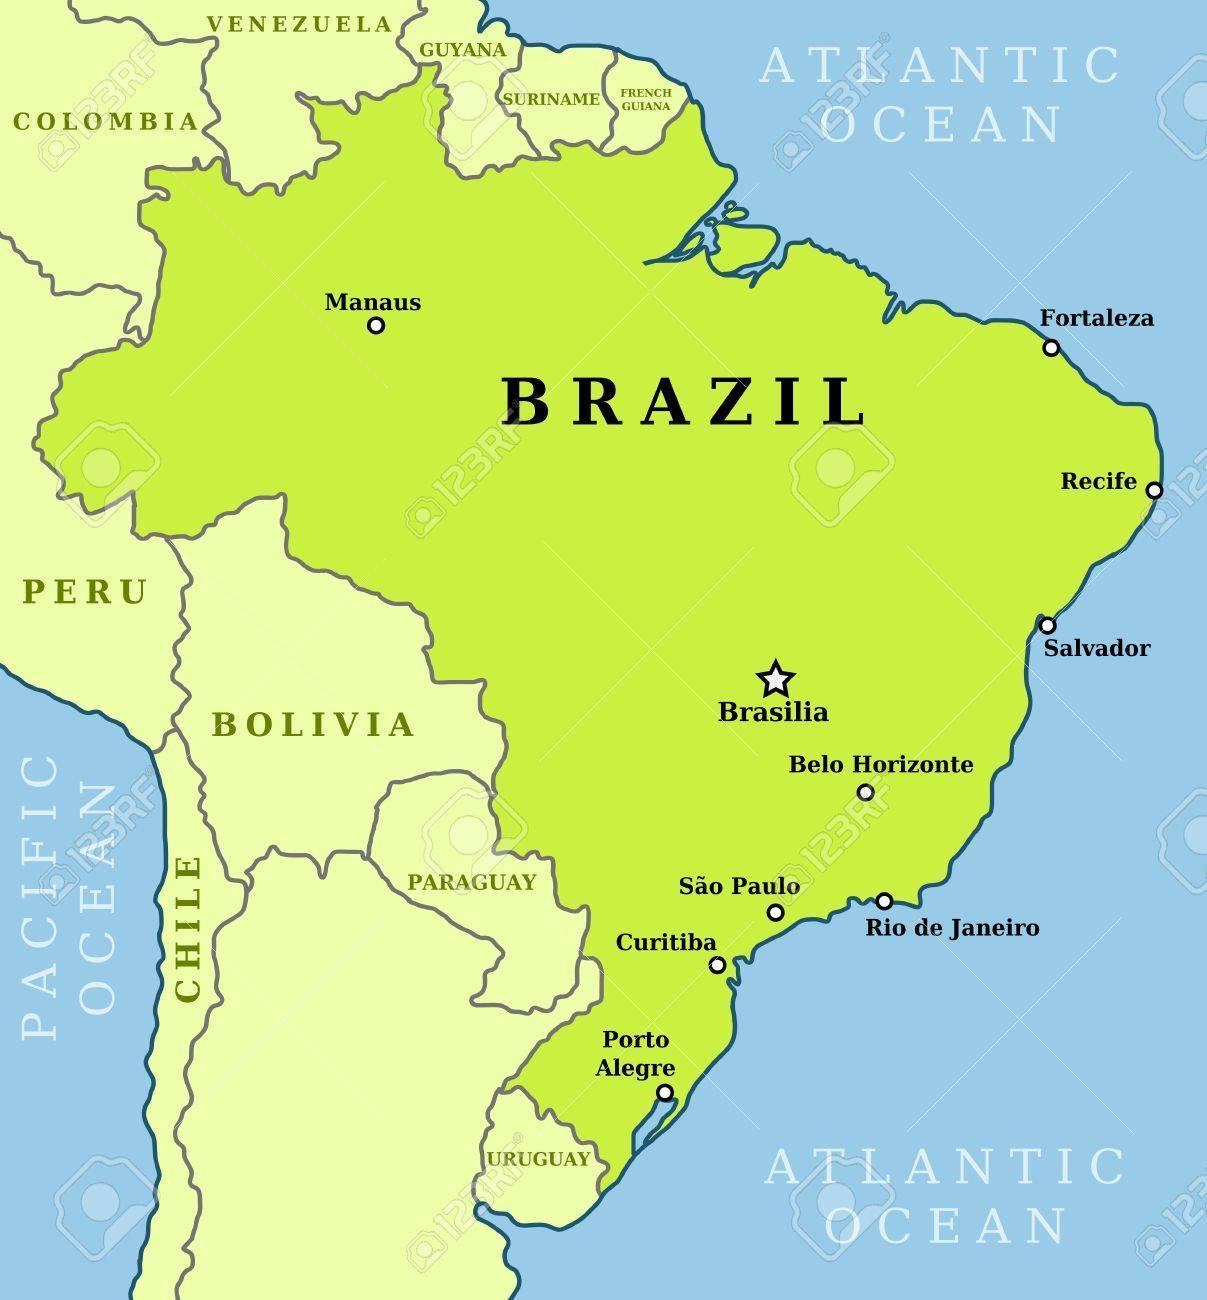 Kort Over Brasilien Byer Brasilien Kort Over Byer Syd Amerika